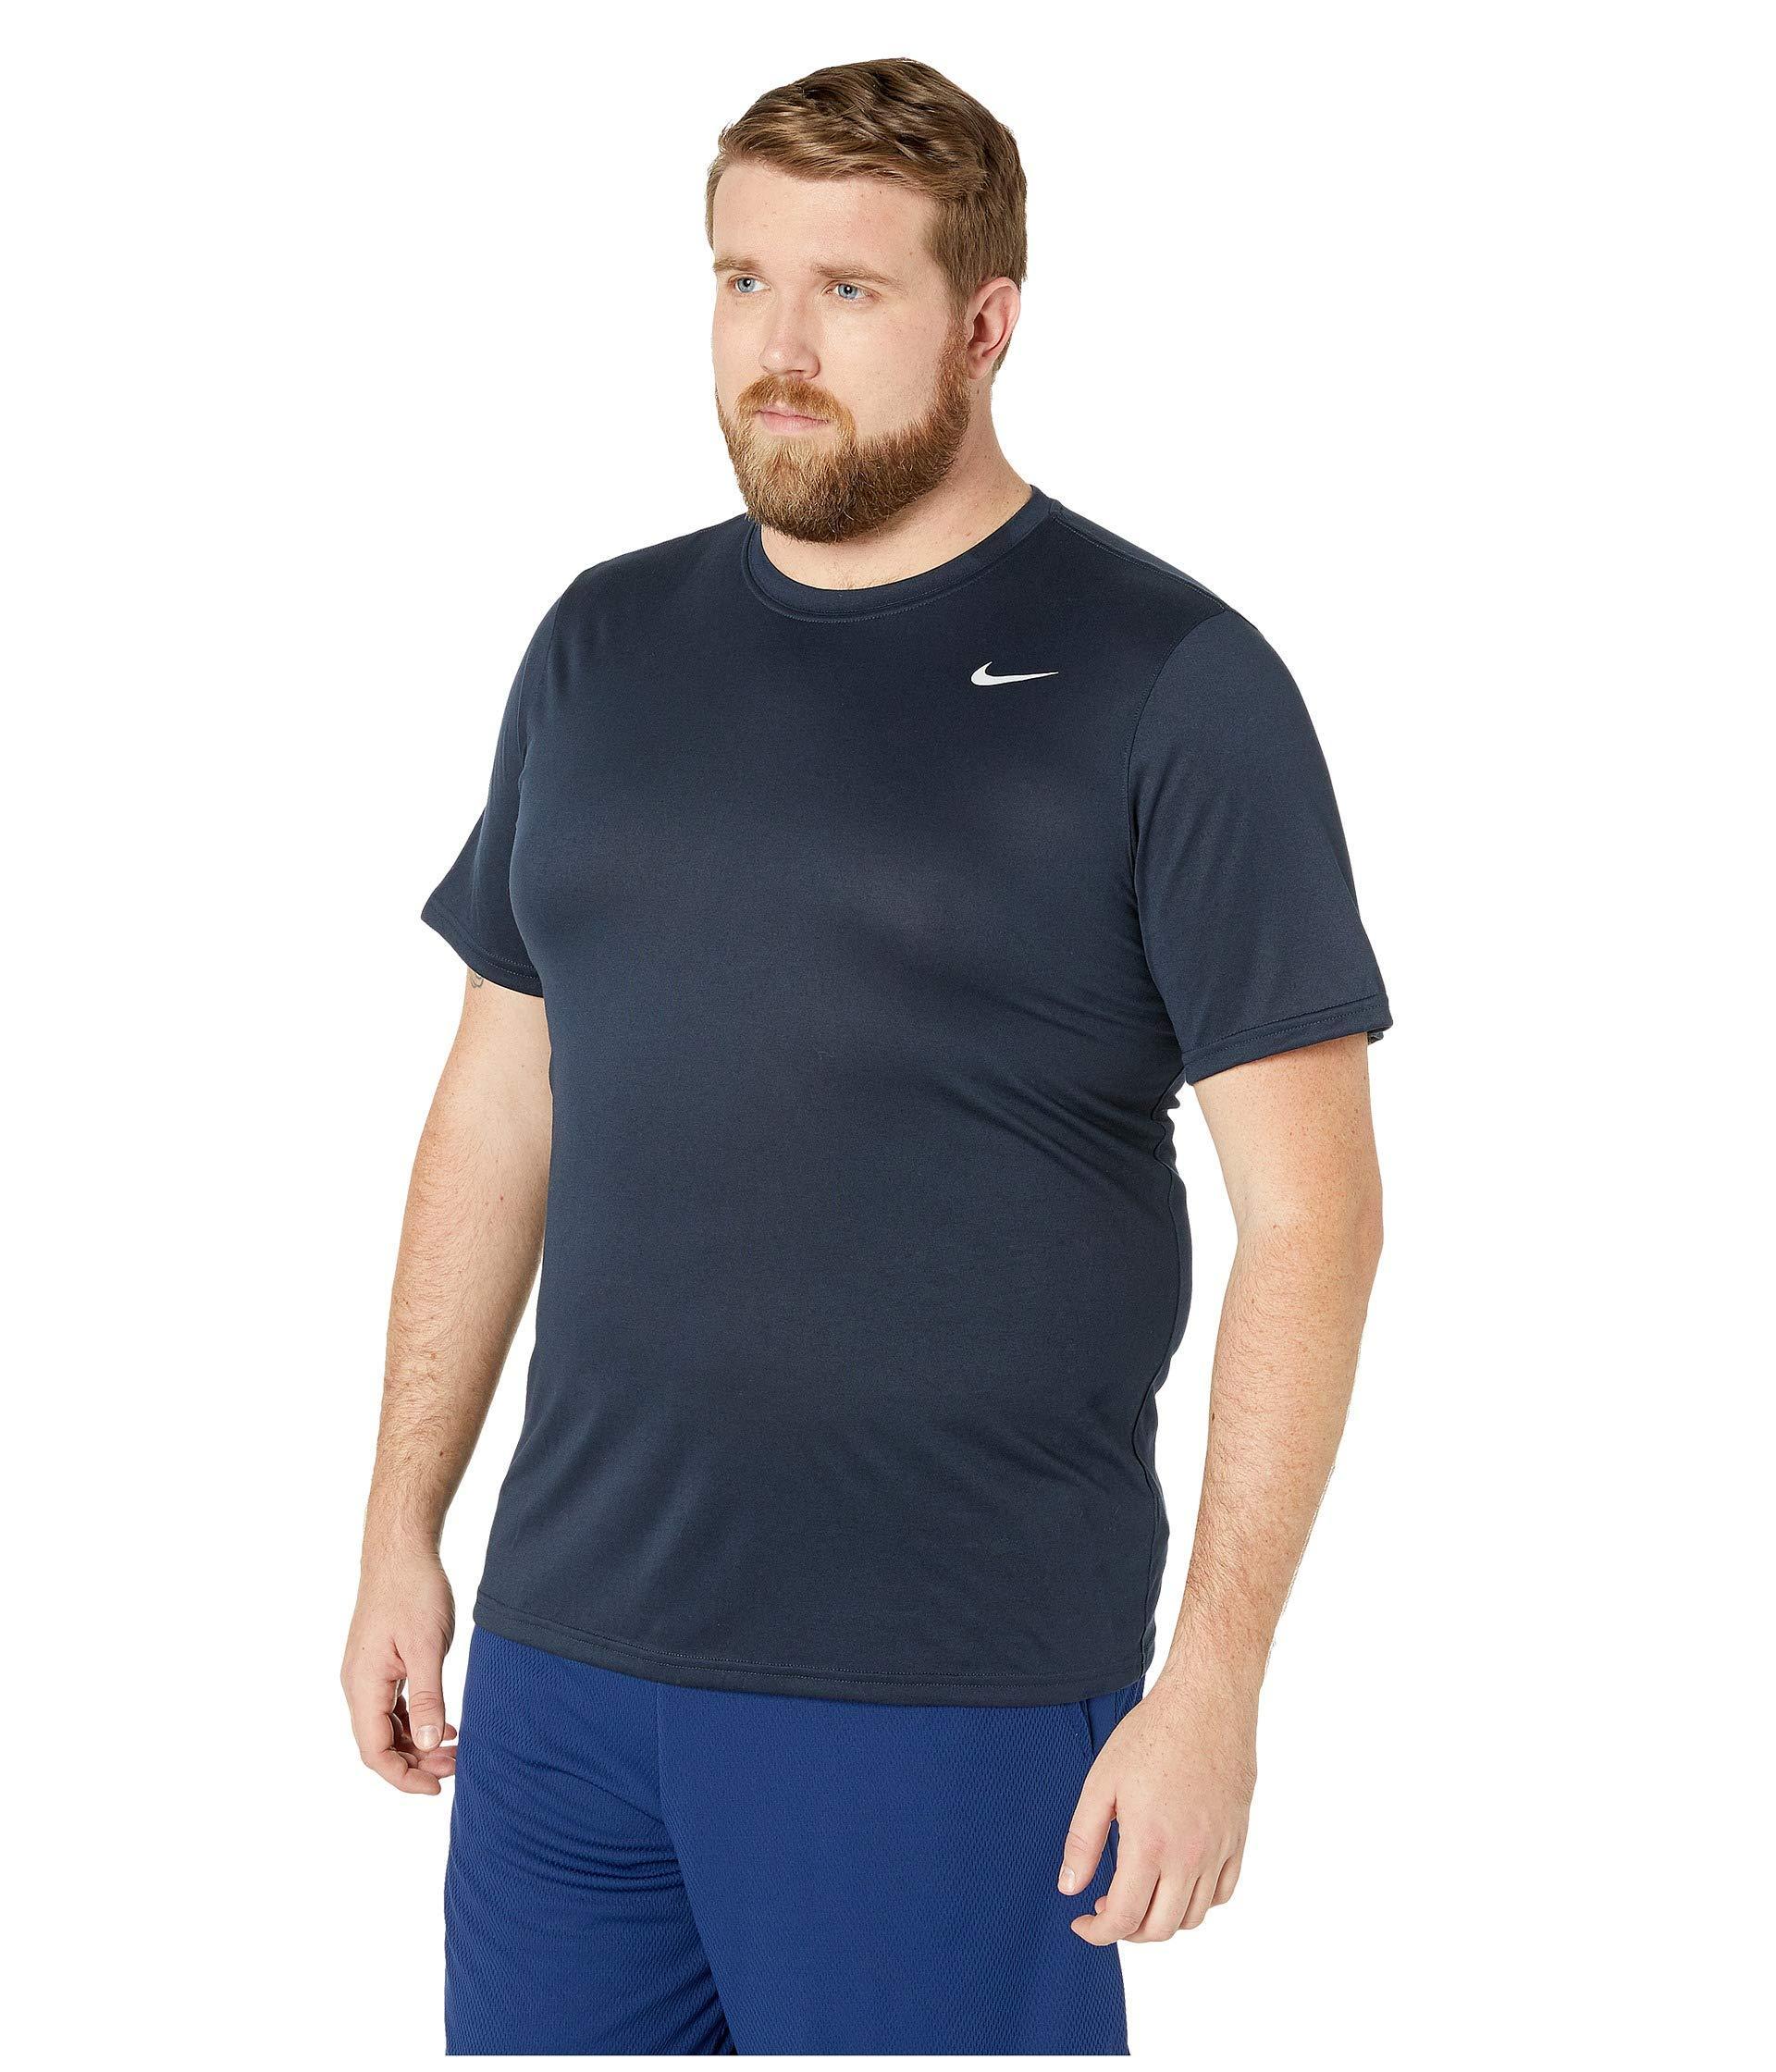 c0165685 Lyst - Nike Big Tall Legend 2.0 Short Sleeve Tee (carbon  Heather/black/black) Men's T Shirt in Black for Men